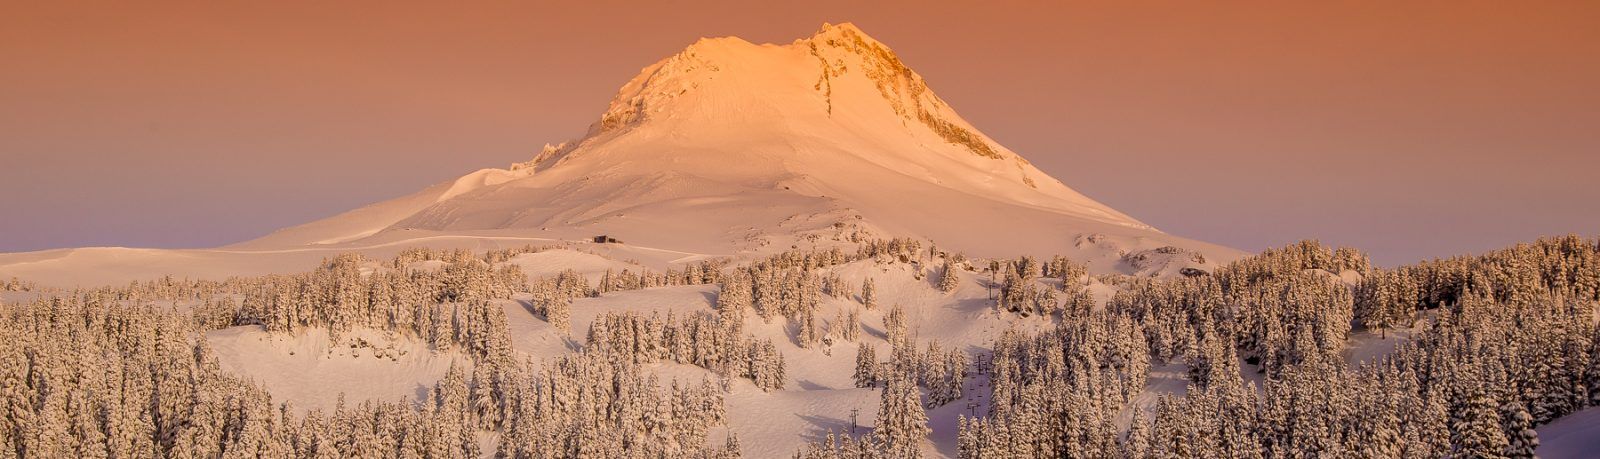 Mt. Hood Meadows & Cooper Spur Team Site